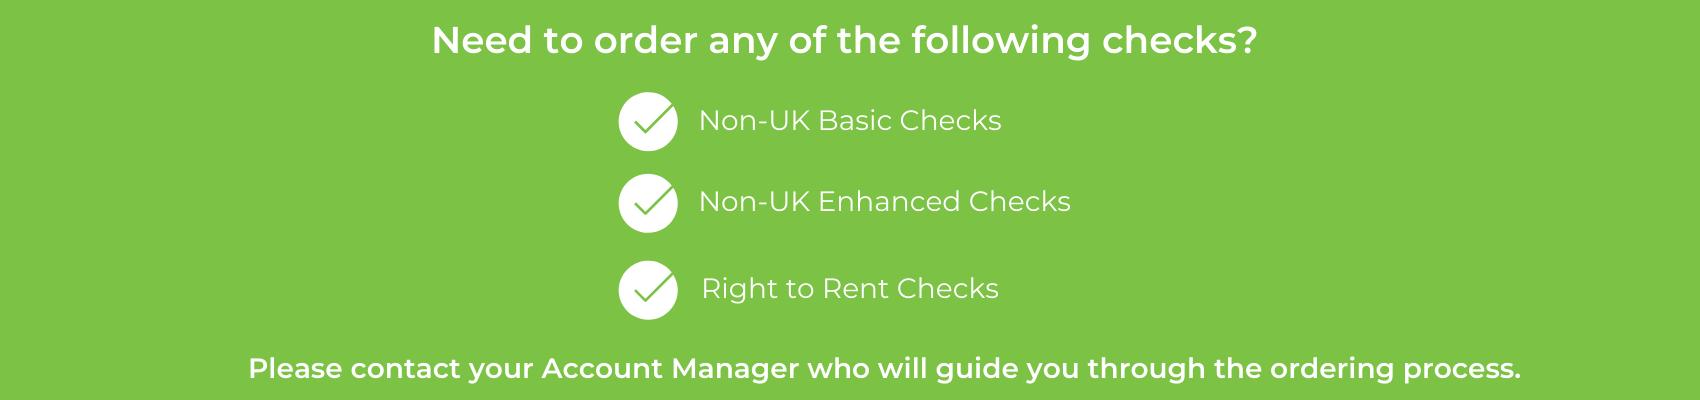 Ordering Non-UK AML Checks